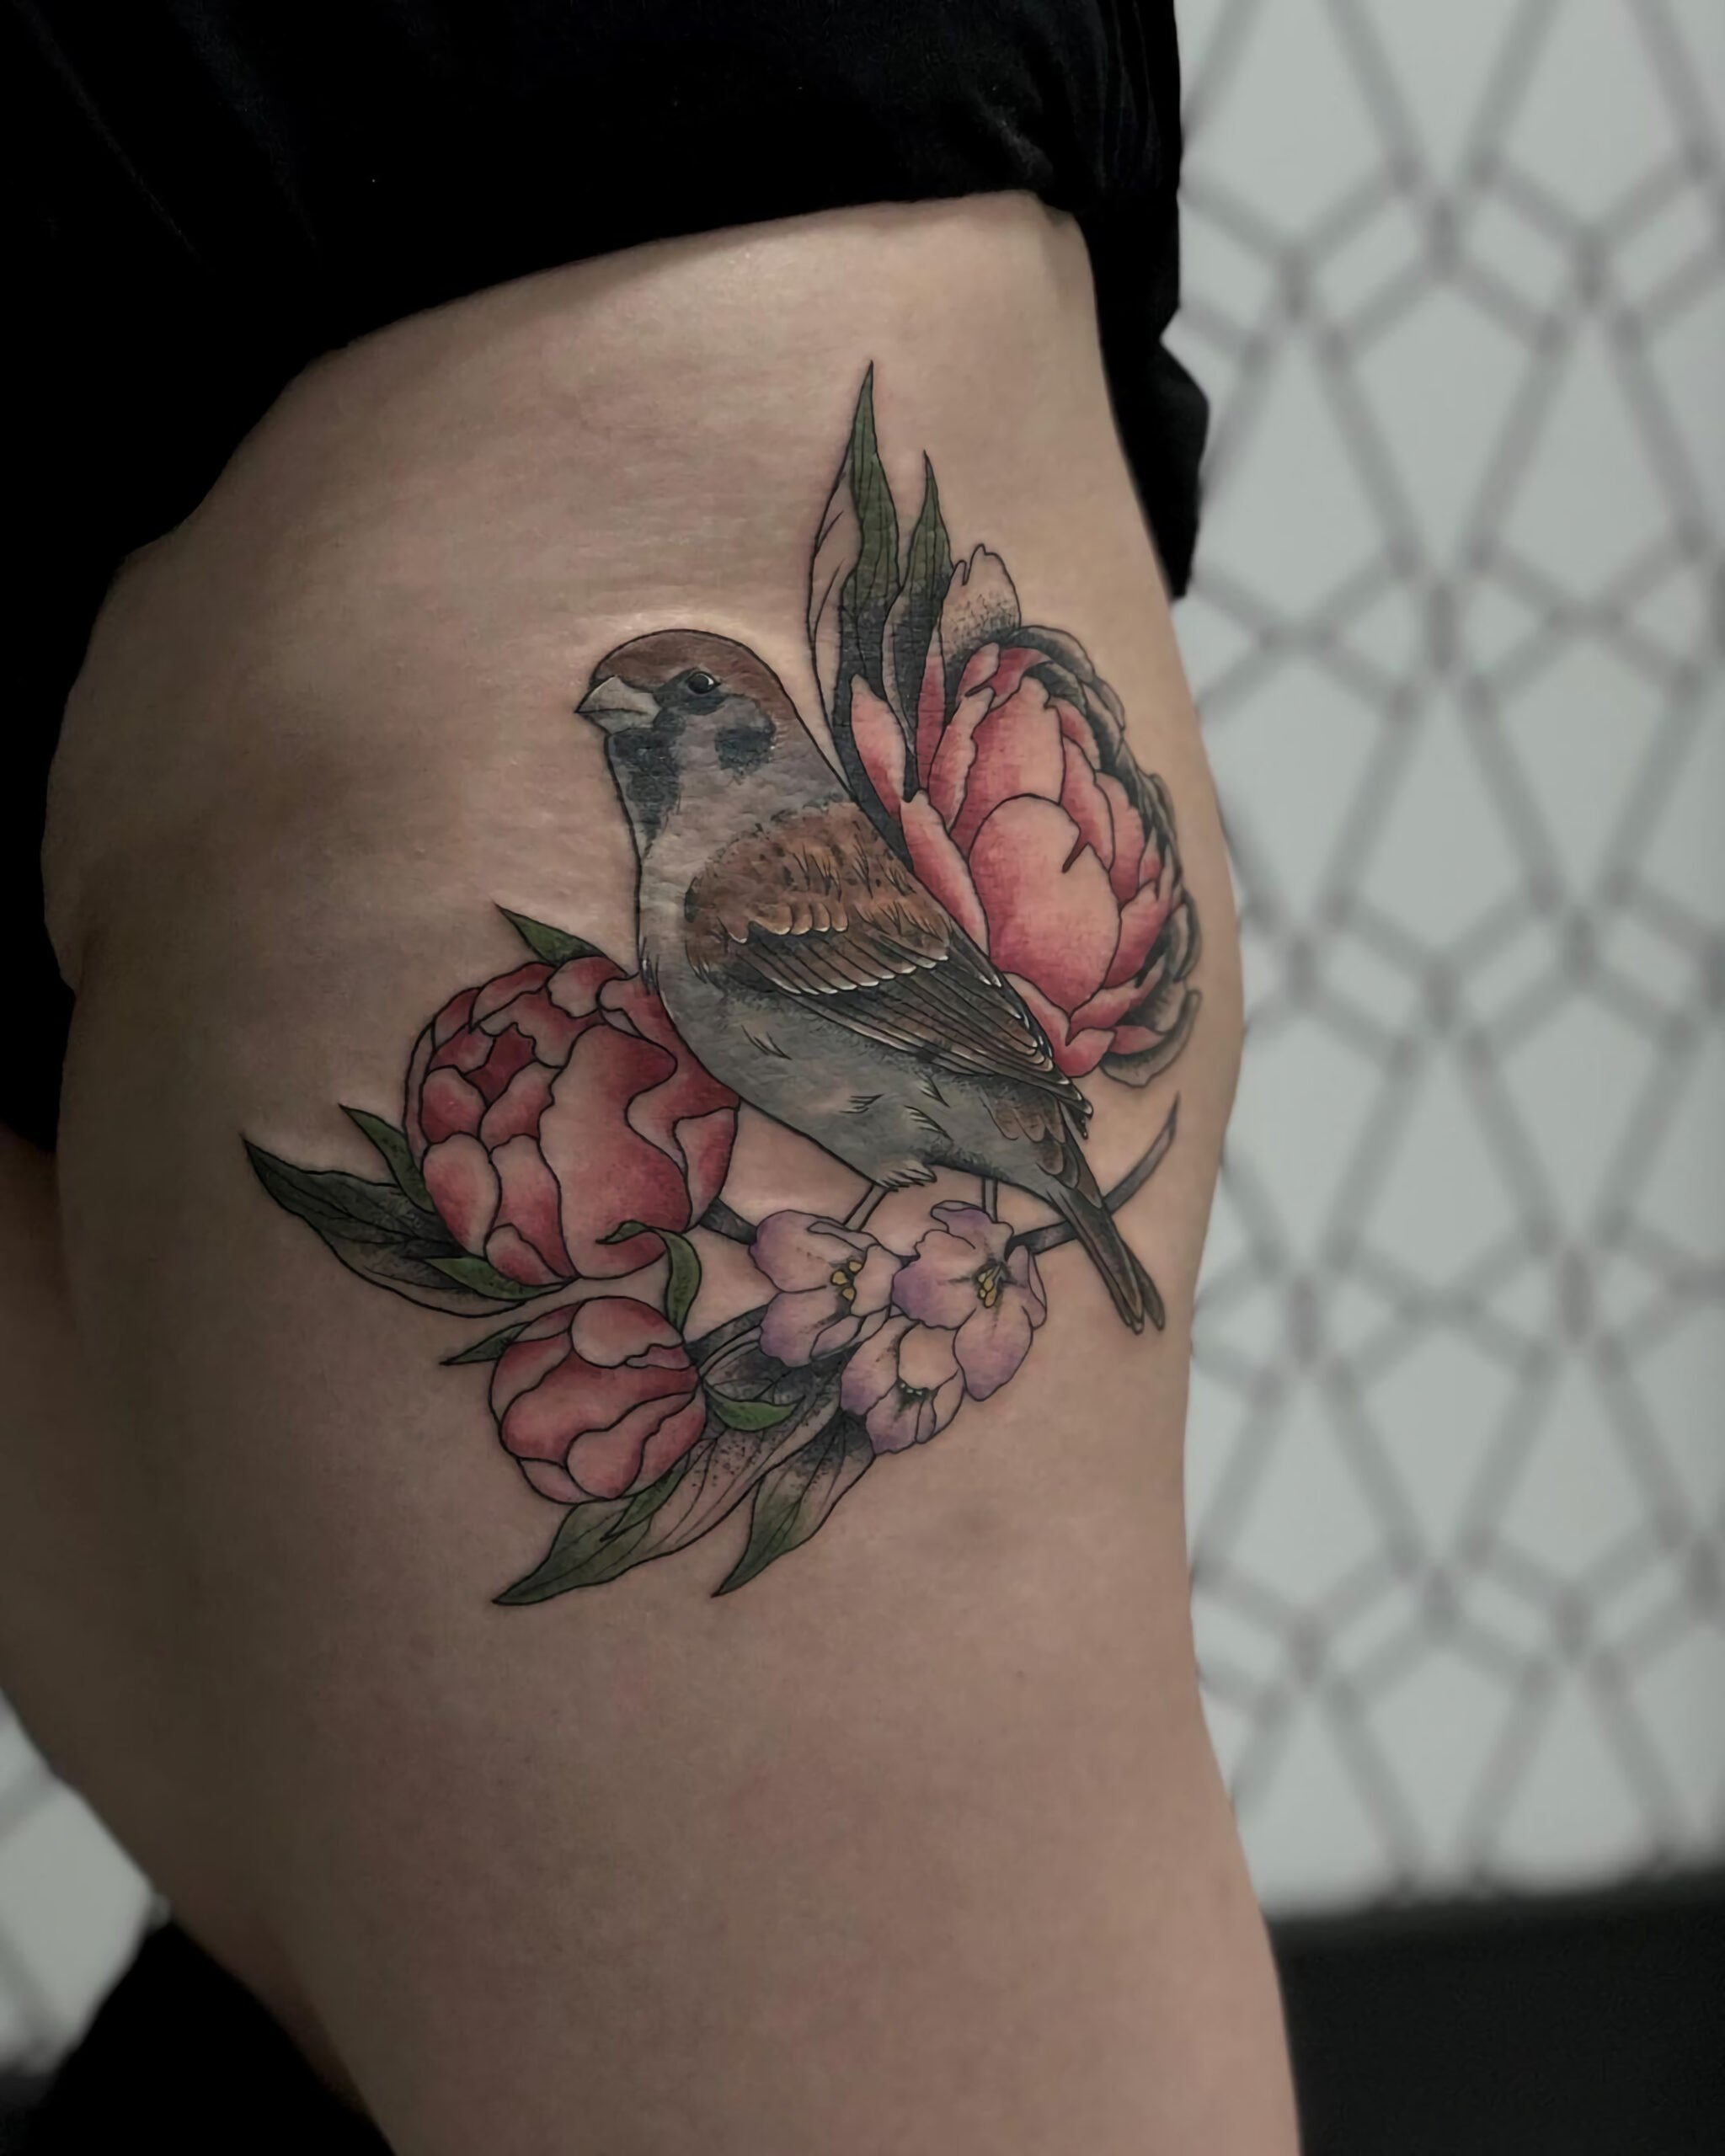 Татуировка ласточки на бедре